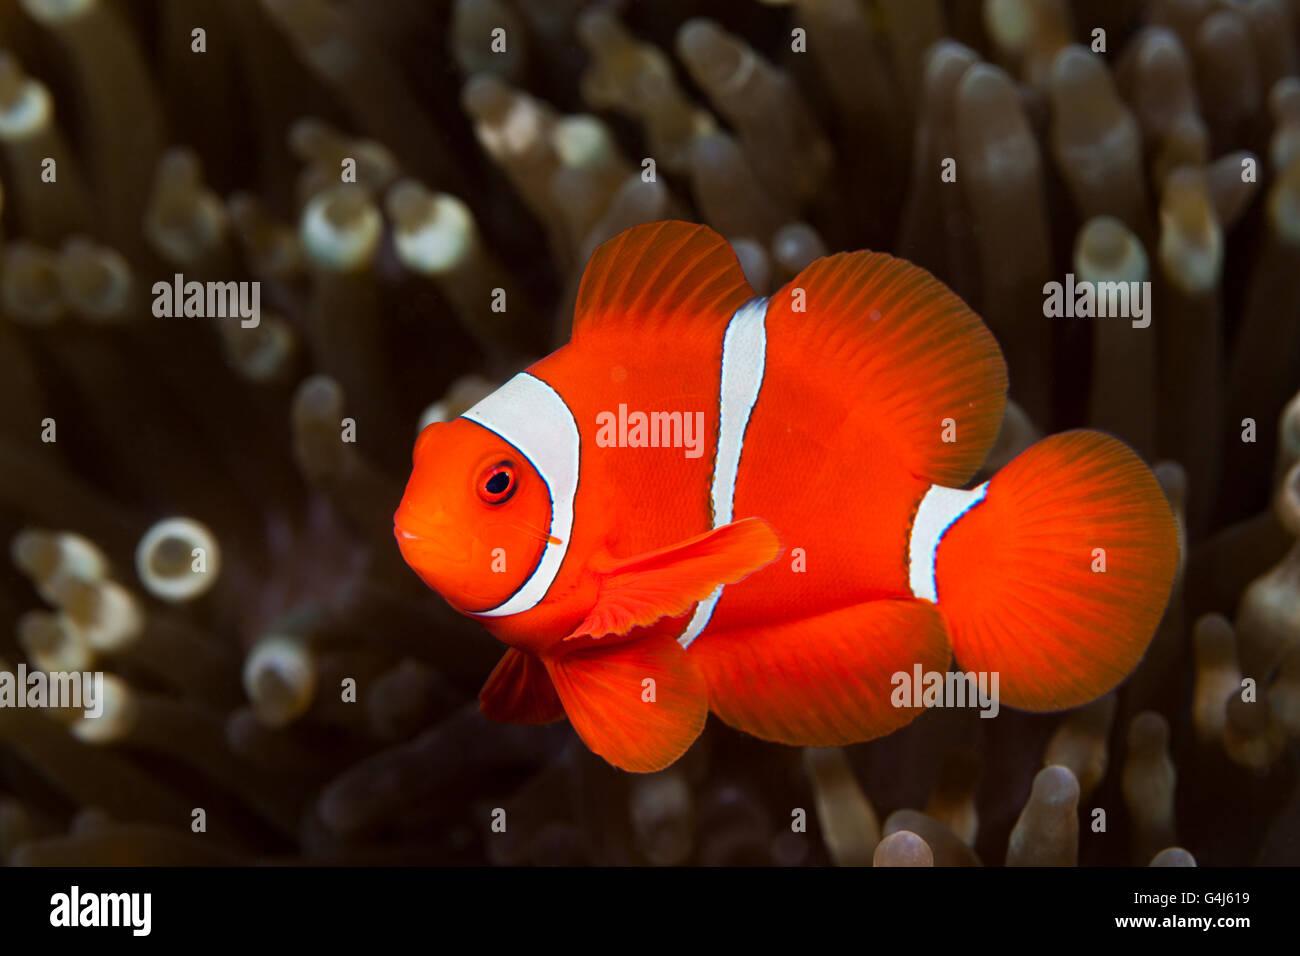 Spinecheek Clownfish, Premnas aculeatus, Ambon, Moluccas, Indonesia Stock Photo